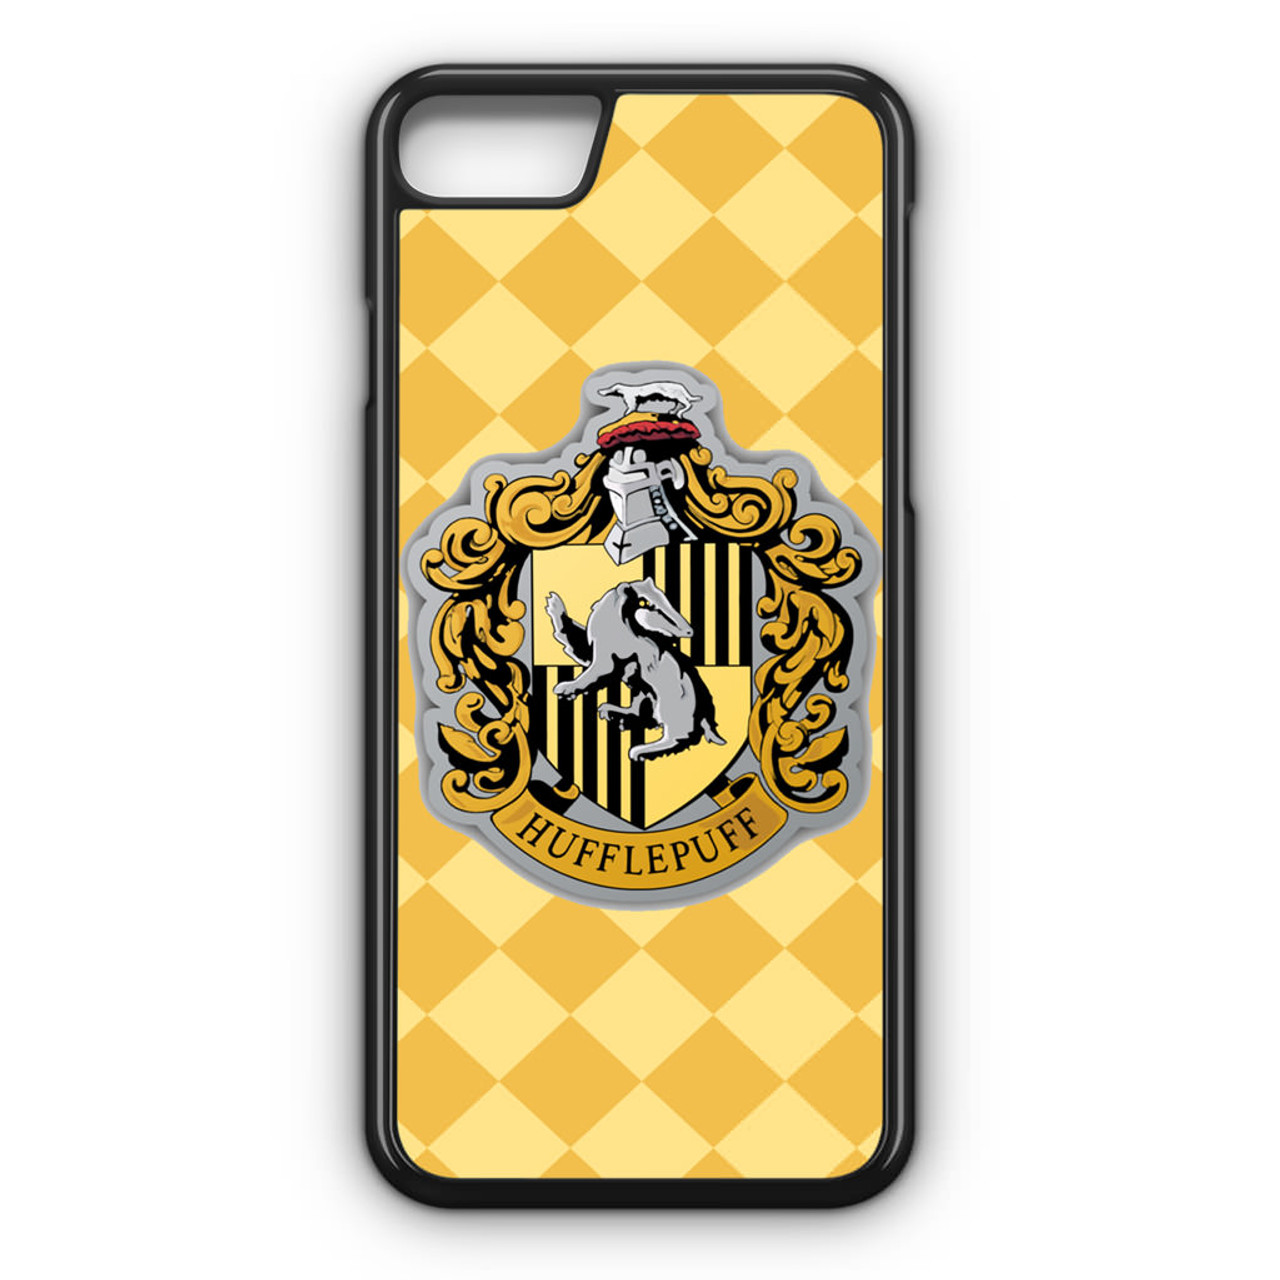 hufflepuff iphone 7 case